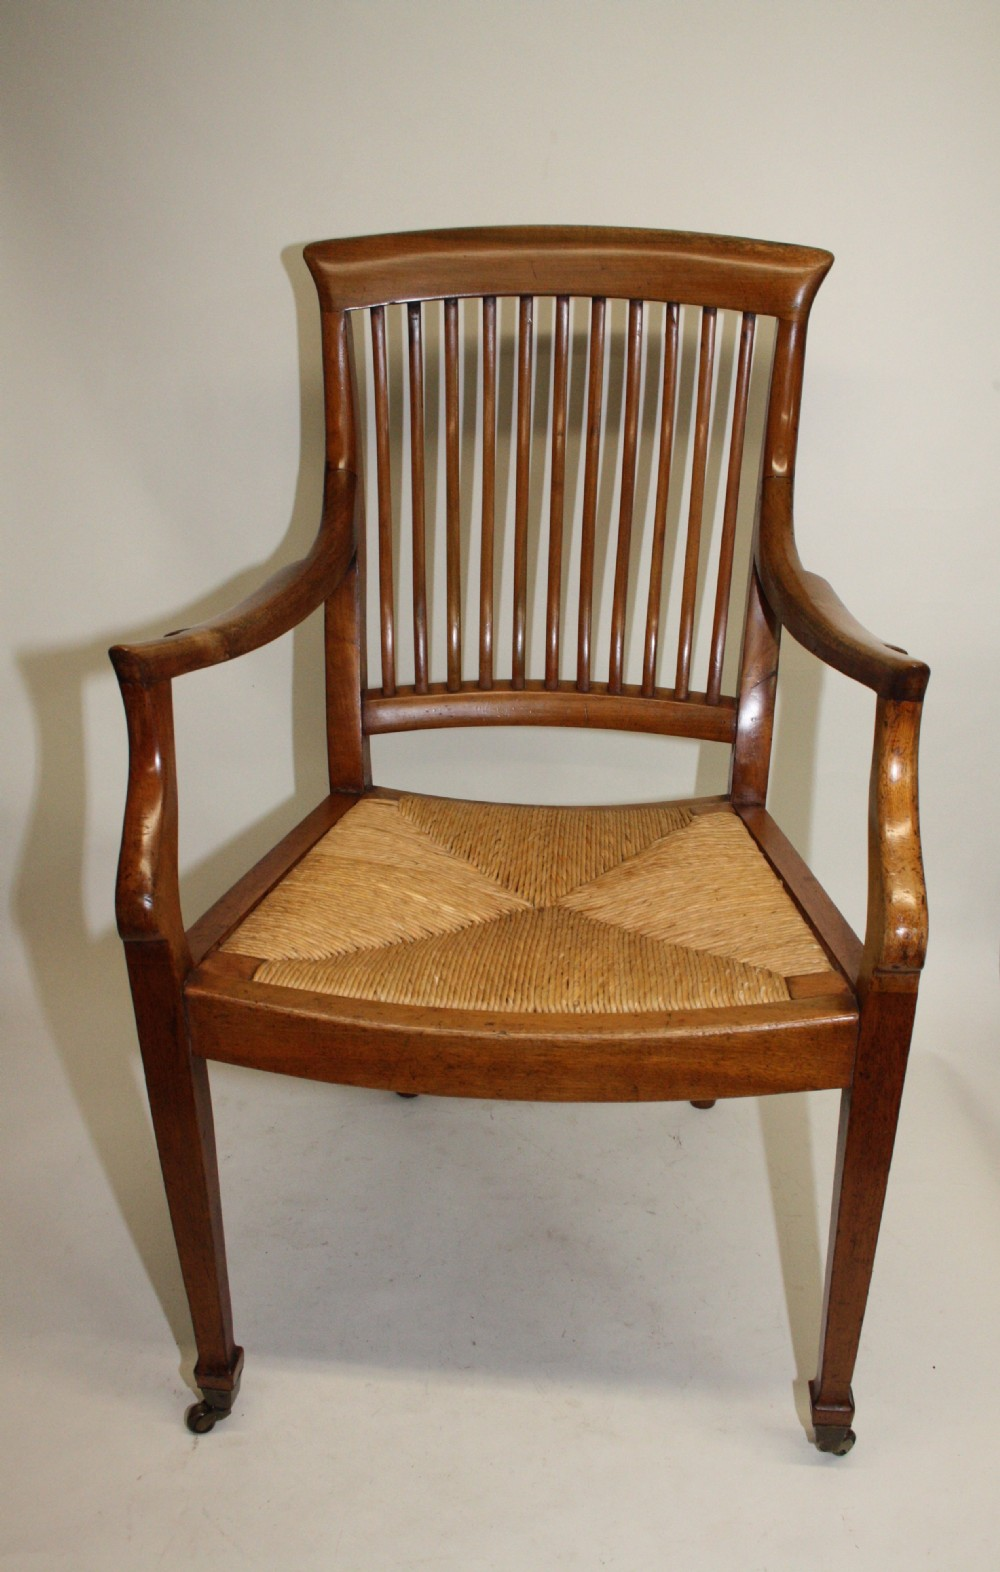 edwardian armchair in birch